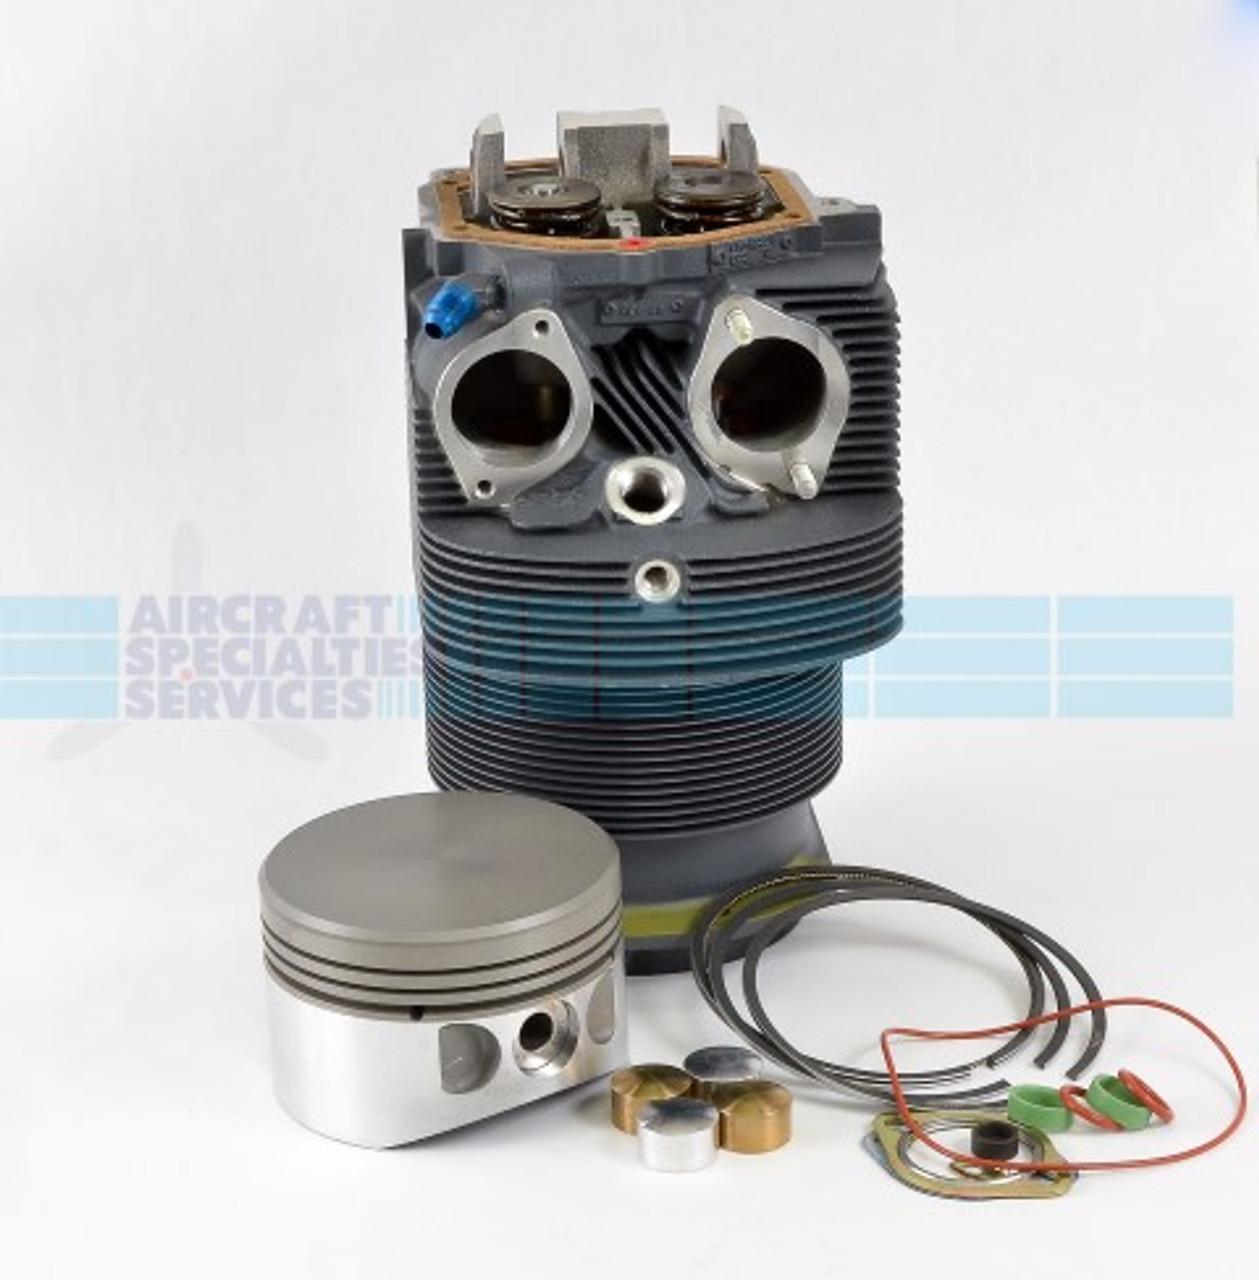 Cylinder Piston & Ring Assy Kit, 0320 Narrow Deck - Lycoming - 05K21101